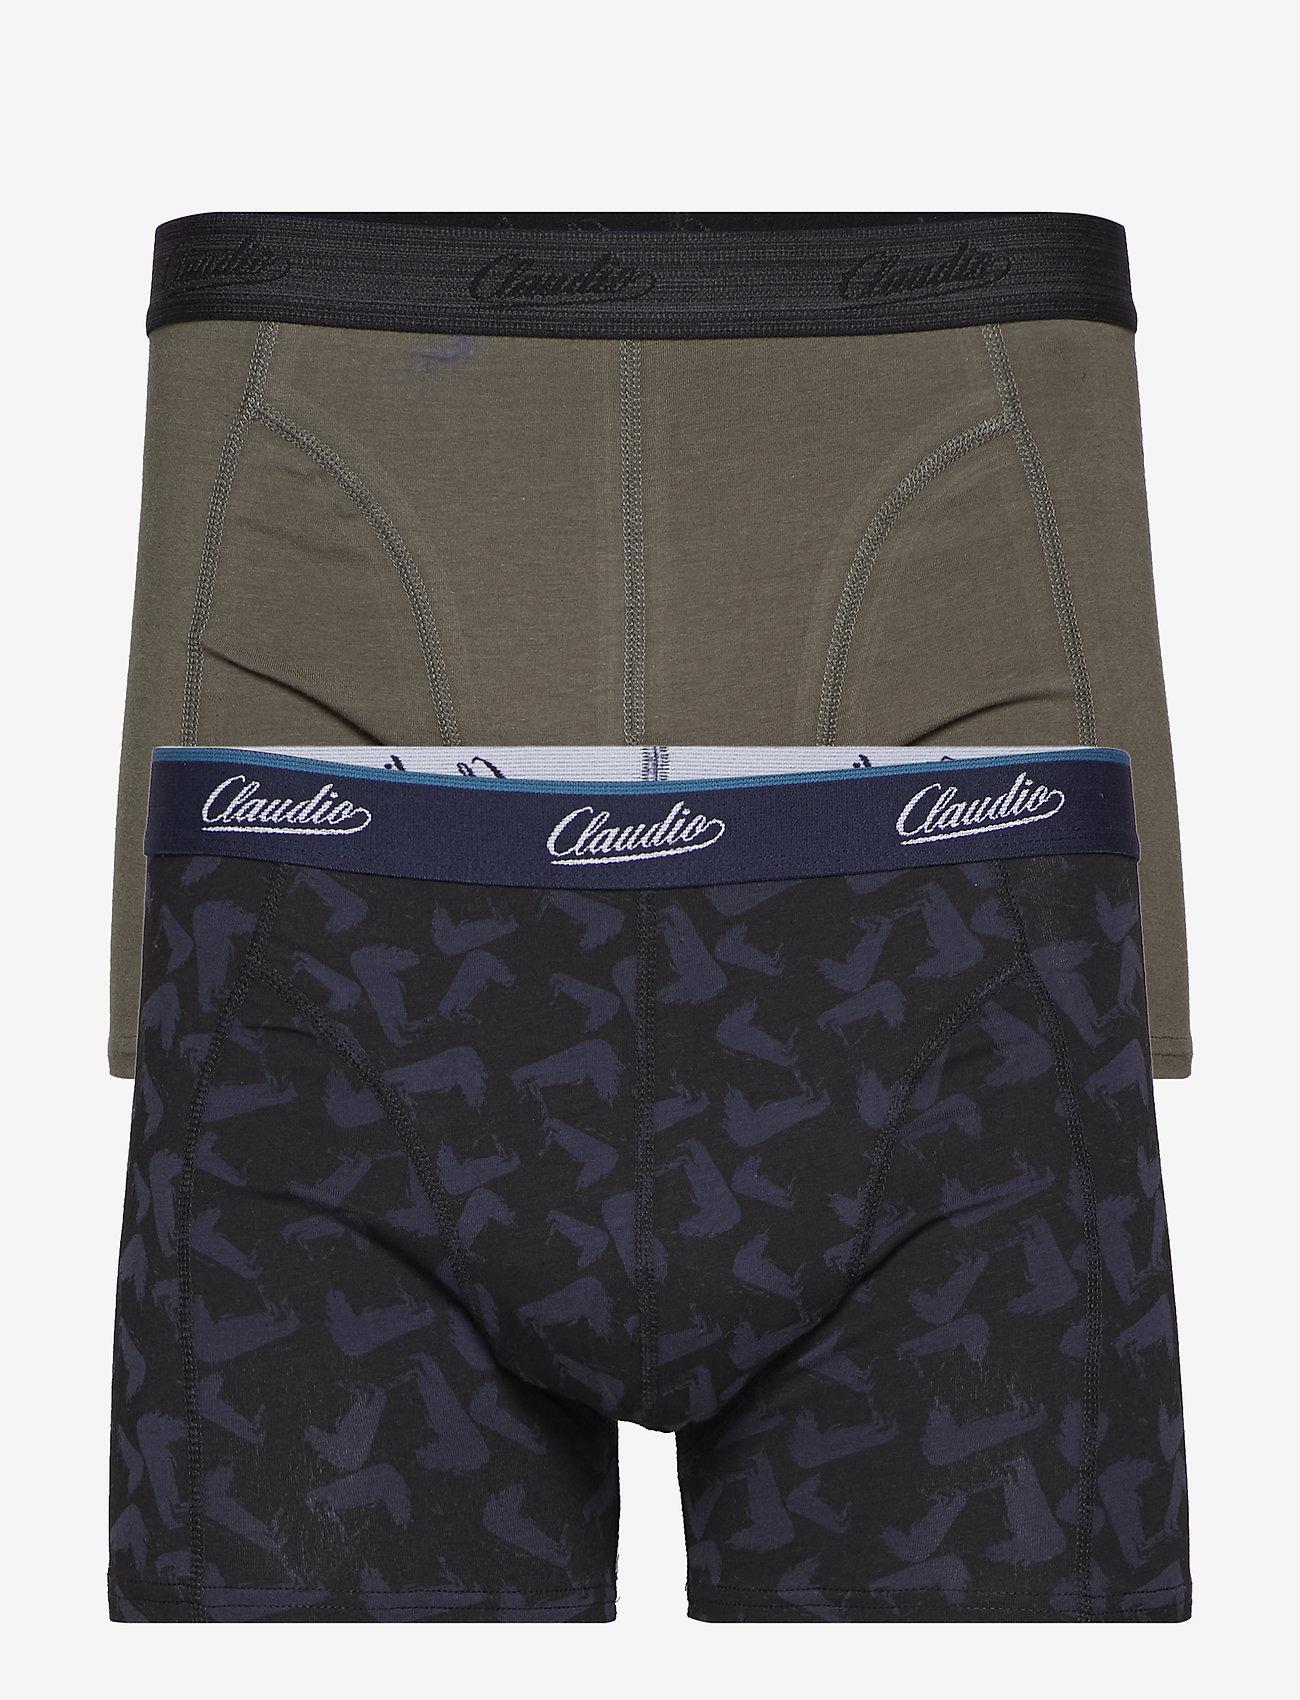 Claudio - Claudio trunk 2-pack - boxershortser - grey+aop - 0